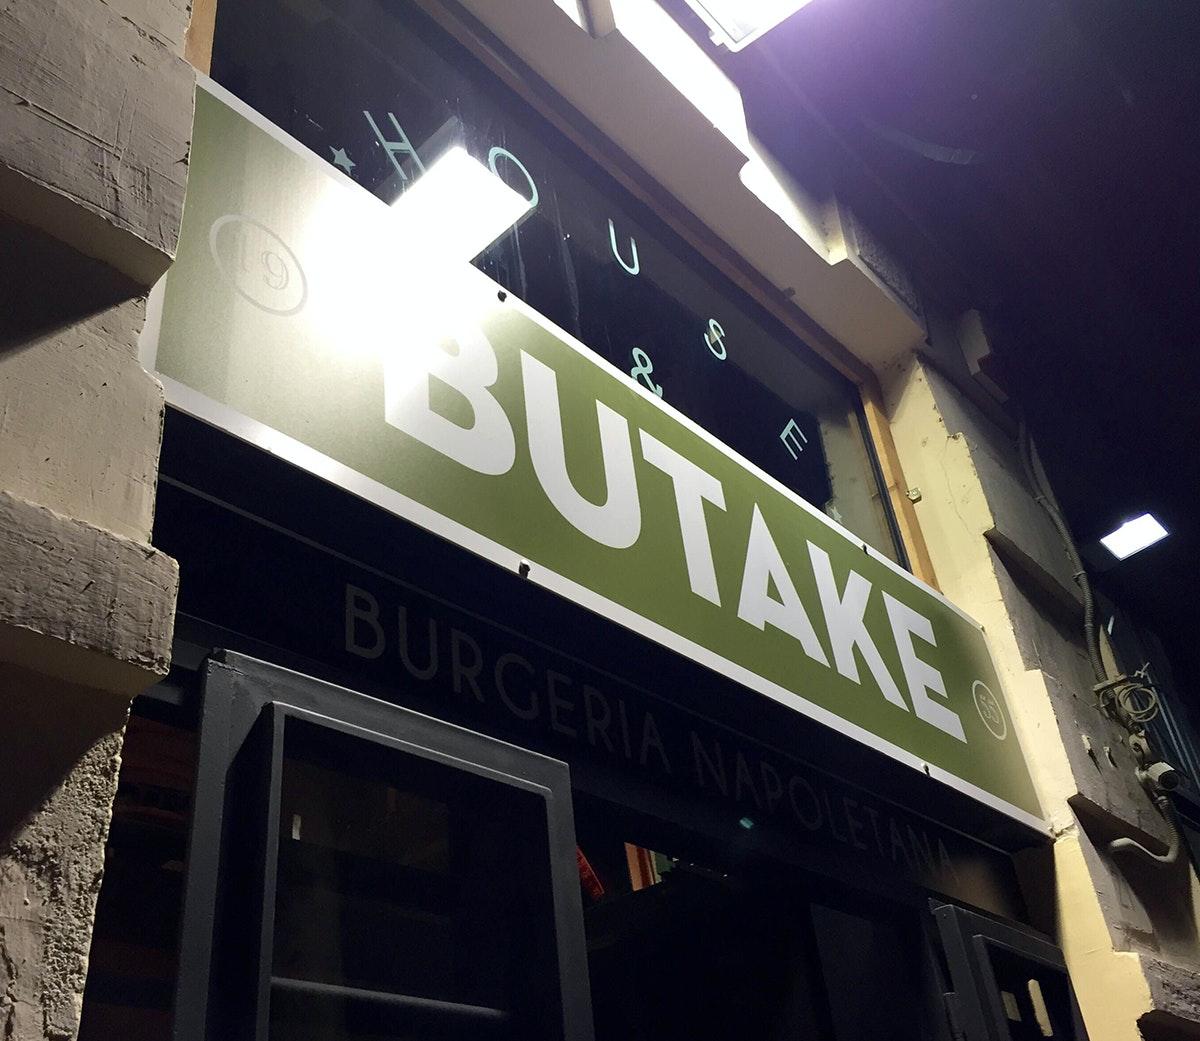 House & Butake